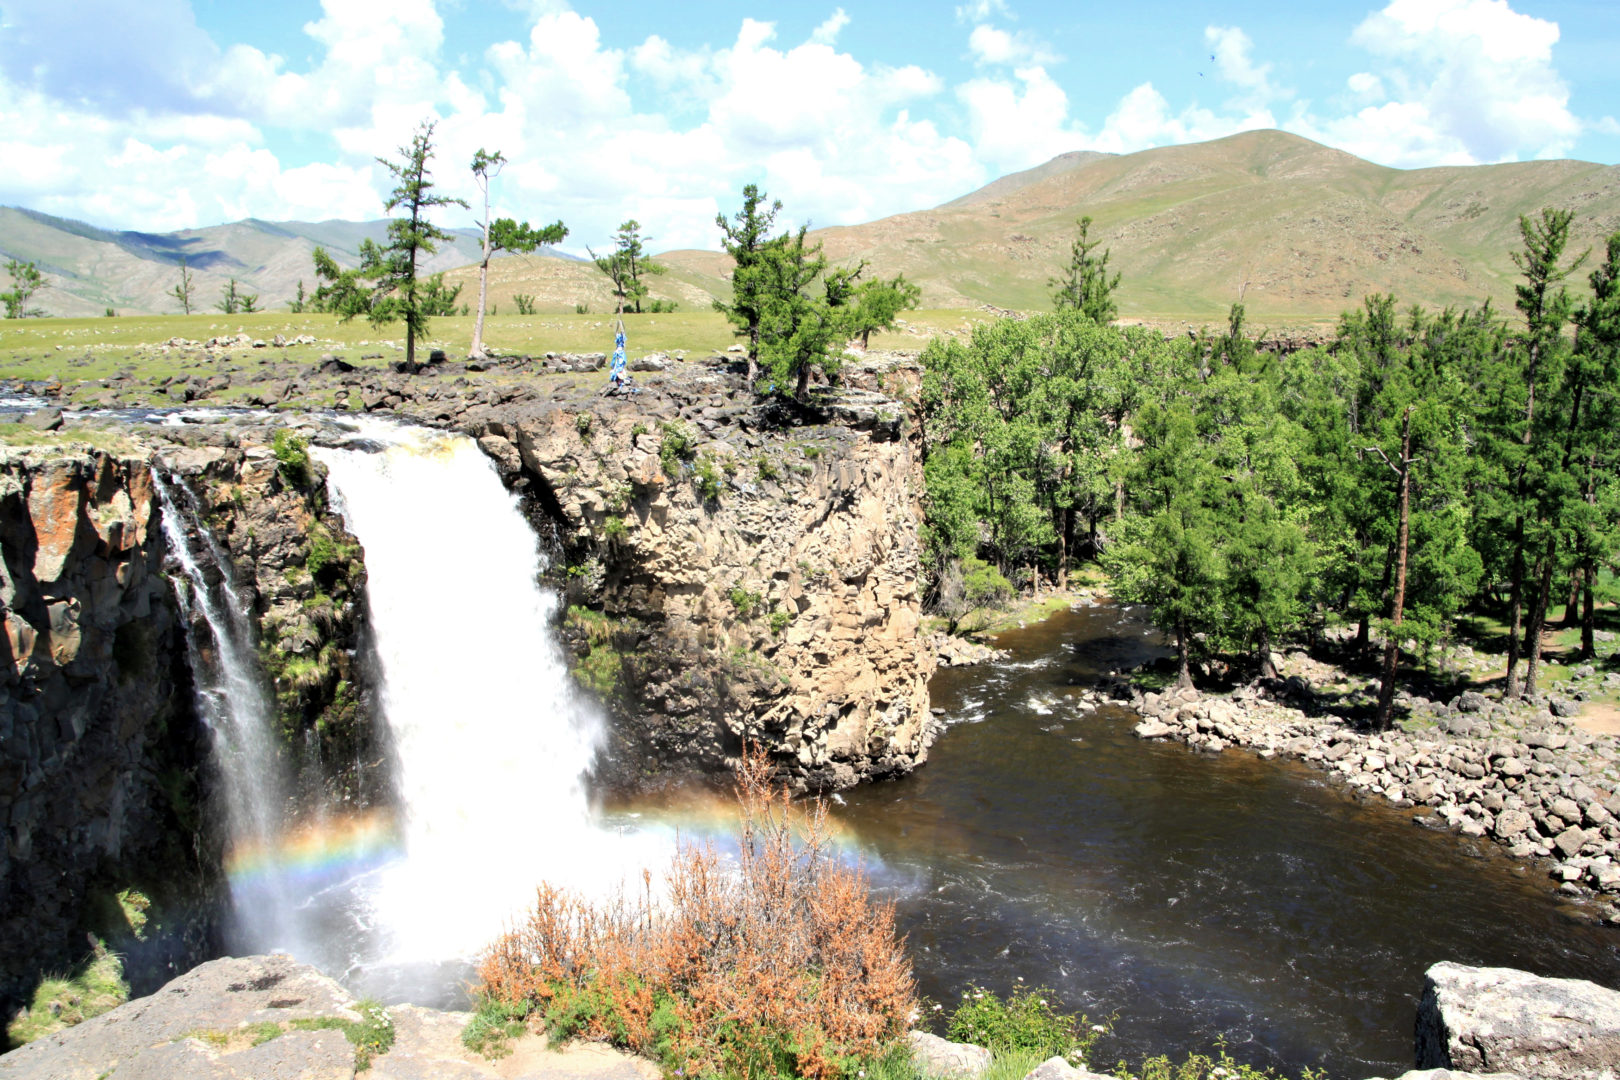 Wasserfall in der Zentralmongolei